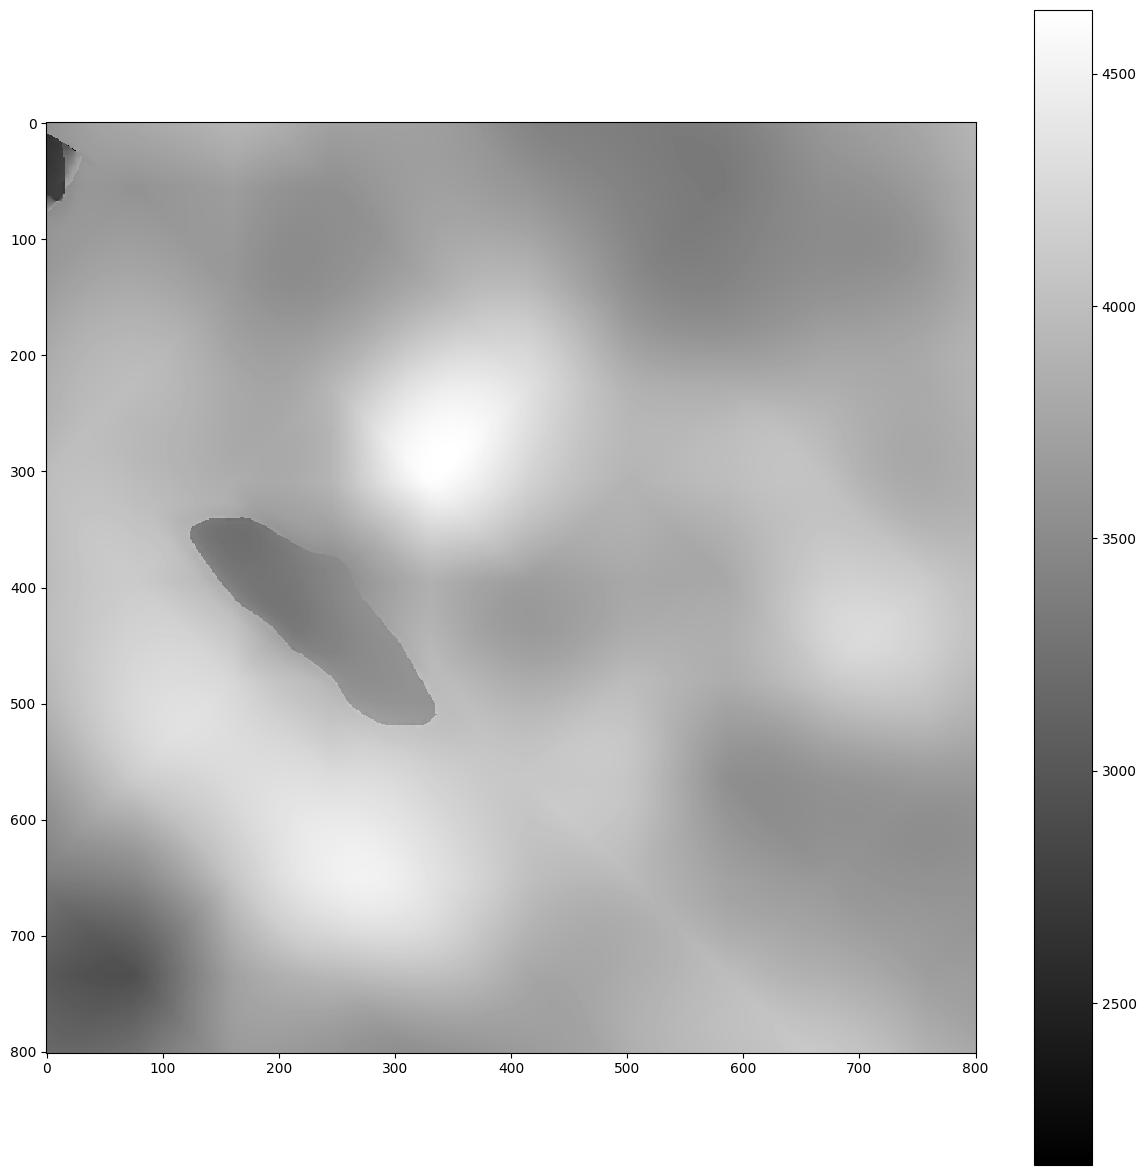 bench/seismic/wp/la_habra/meshes/velocity_model/plots/vs_7500.png